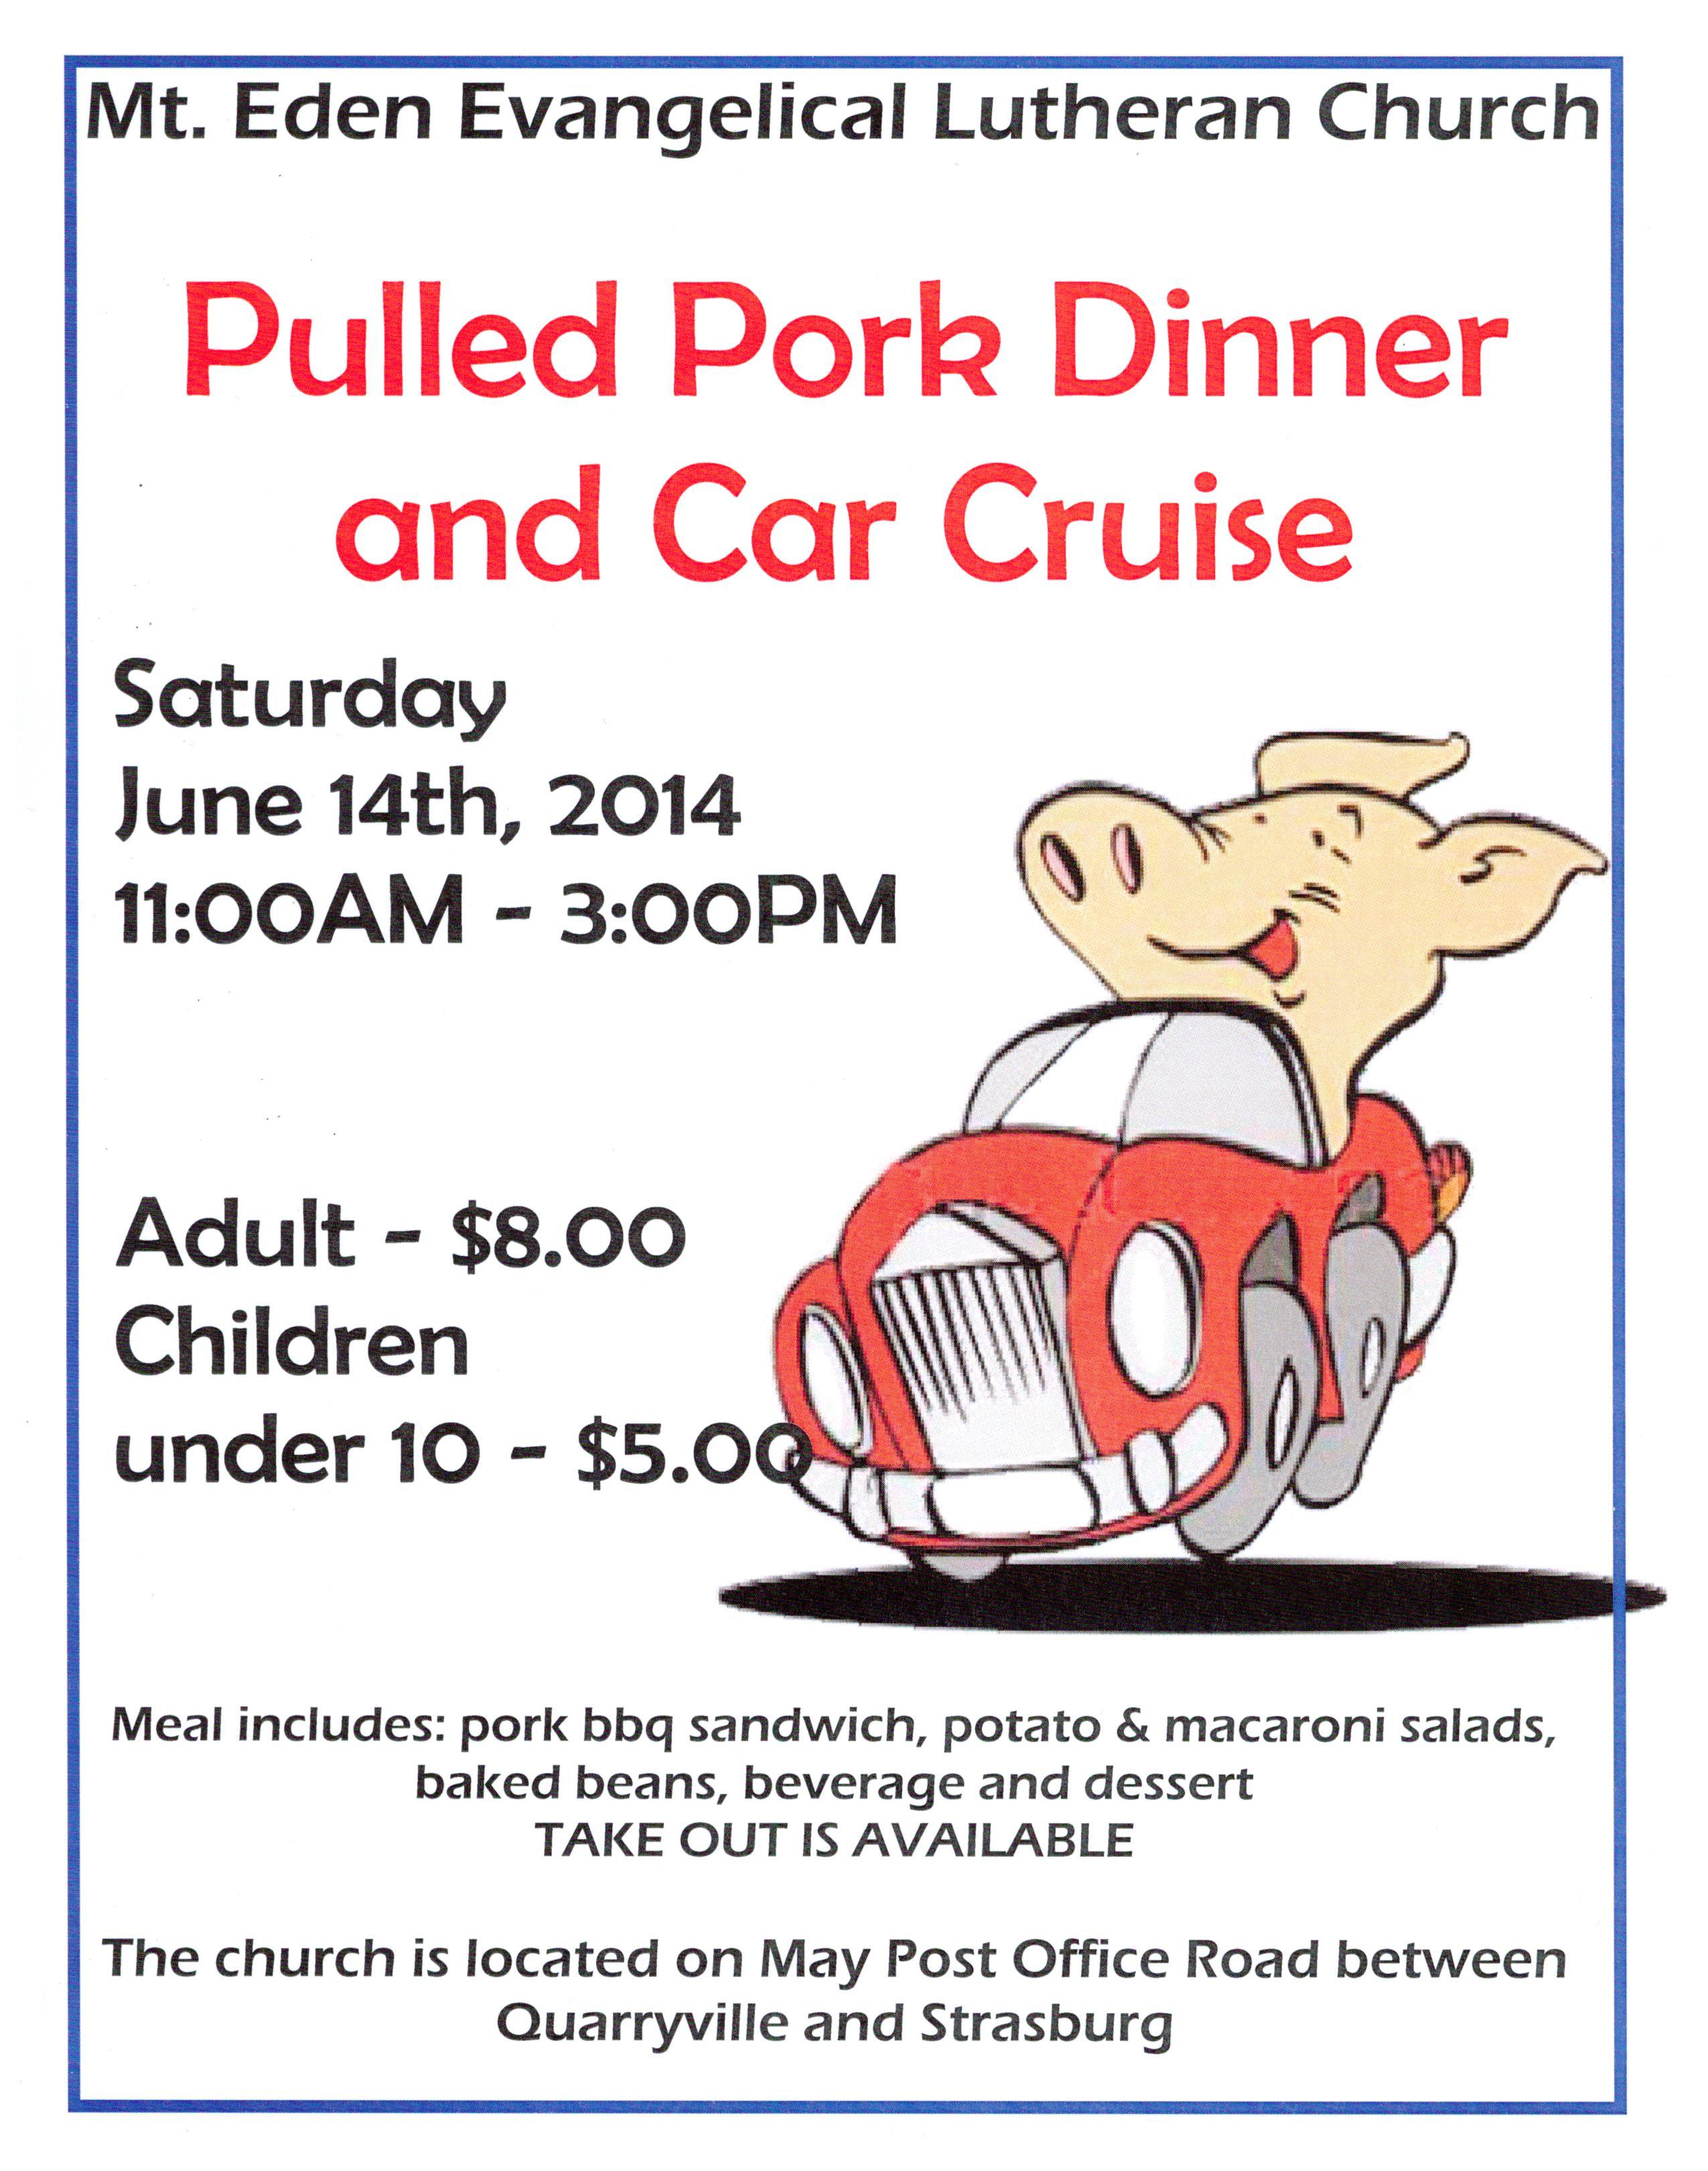 Pork dinner and car cruise 2014 001